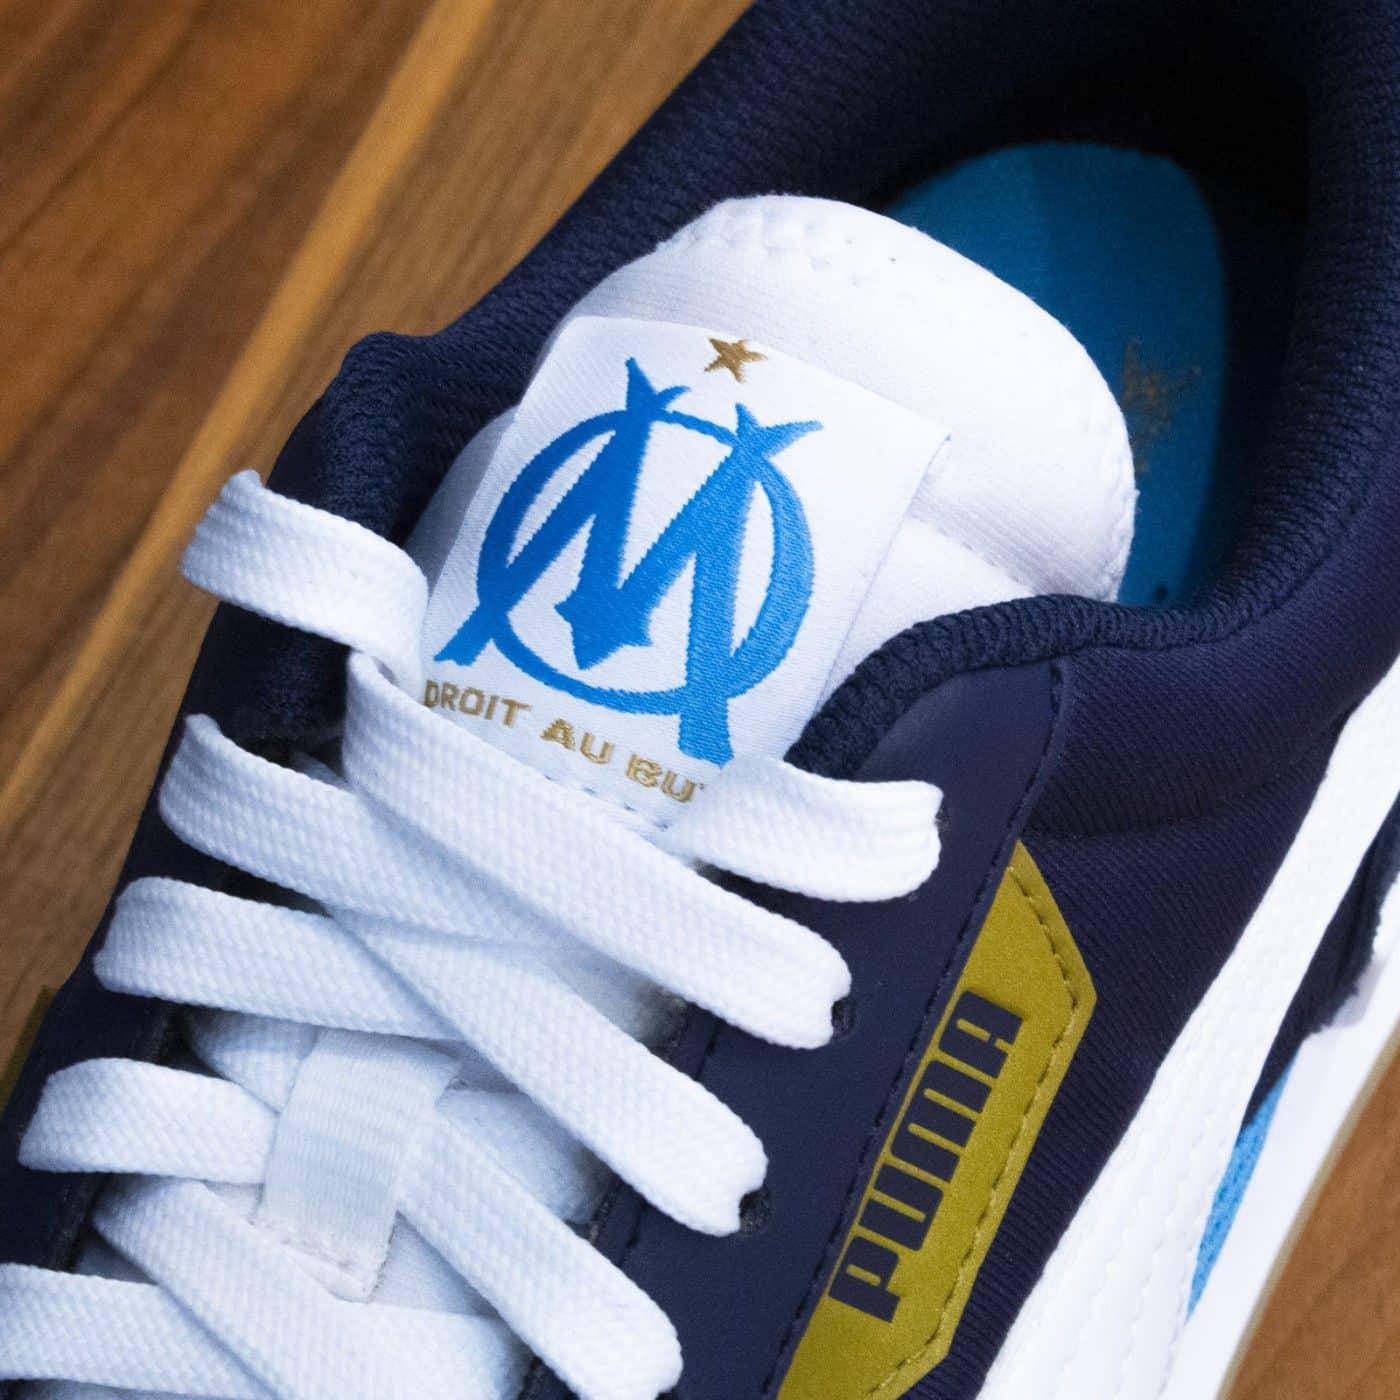 puma-rider-om-marseille-sneakers-4